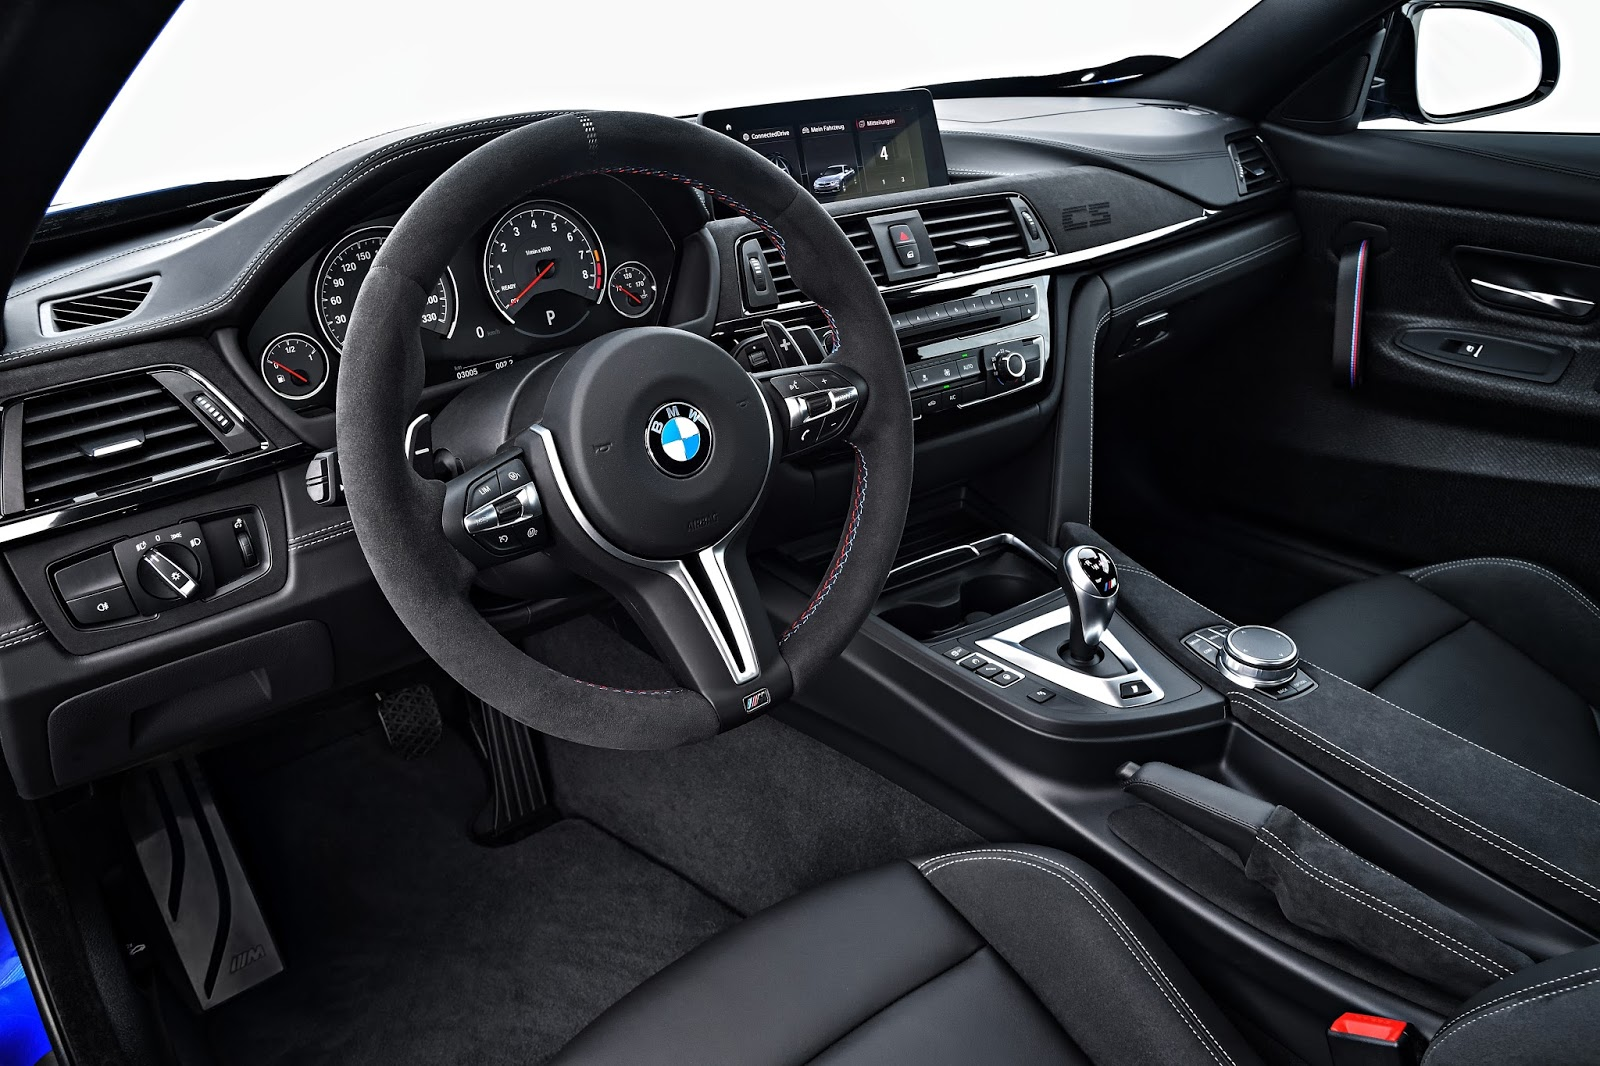 P90251059 highRes the new bmw m4 cs 04 Η περιορισμένης παραγωγής BMW M4 ClubSport δική σας με 116.900 ευρώ BMW, BMW M, BMW M4, BMW M4 CS, BMW Motorsport, clubsport, COUPE, Limited edition, supercars, supersport, videos, Περιορισμένης παραγωγής